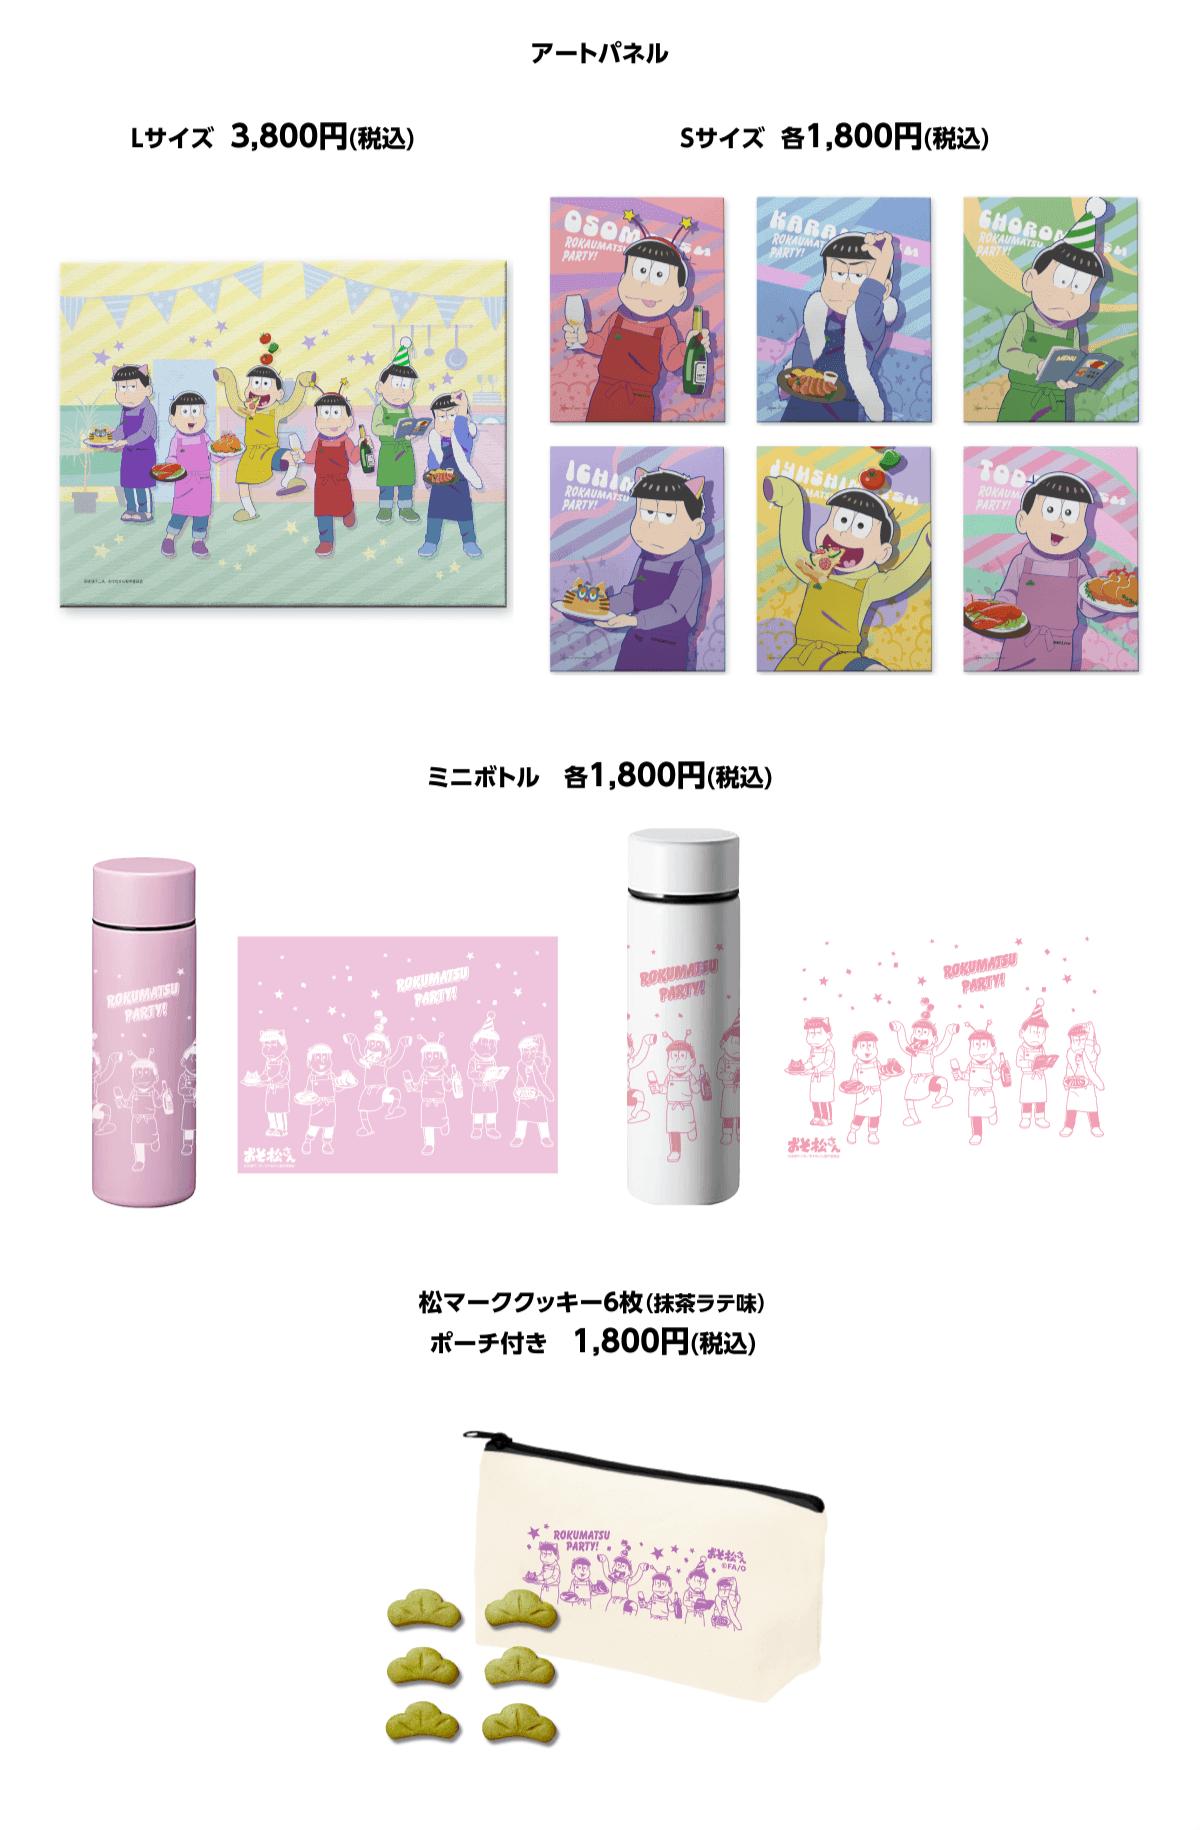 Image goods 02